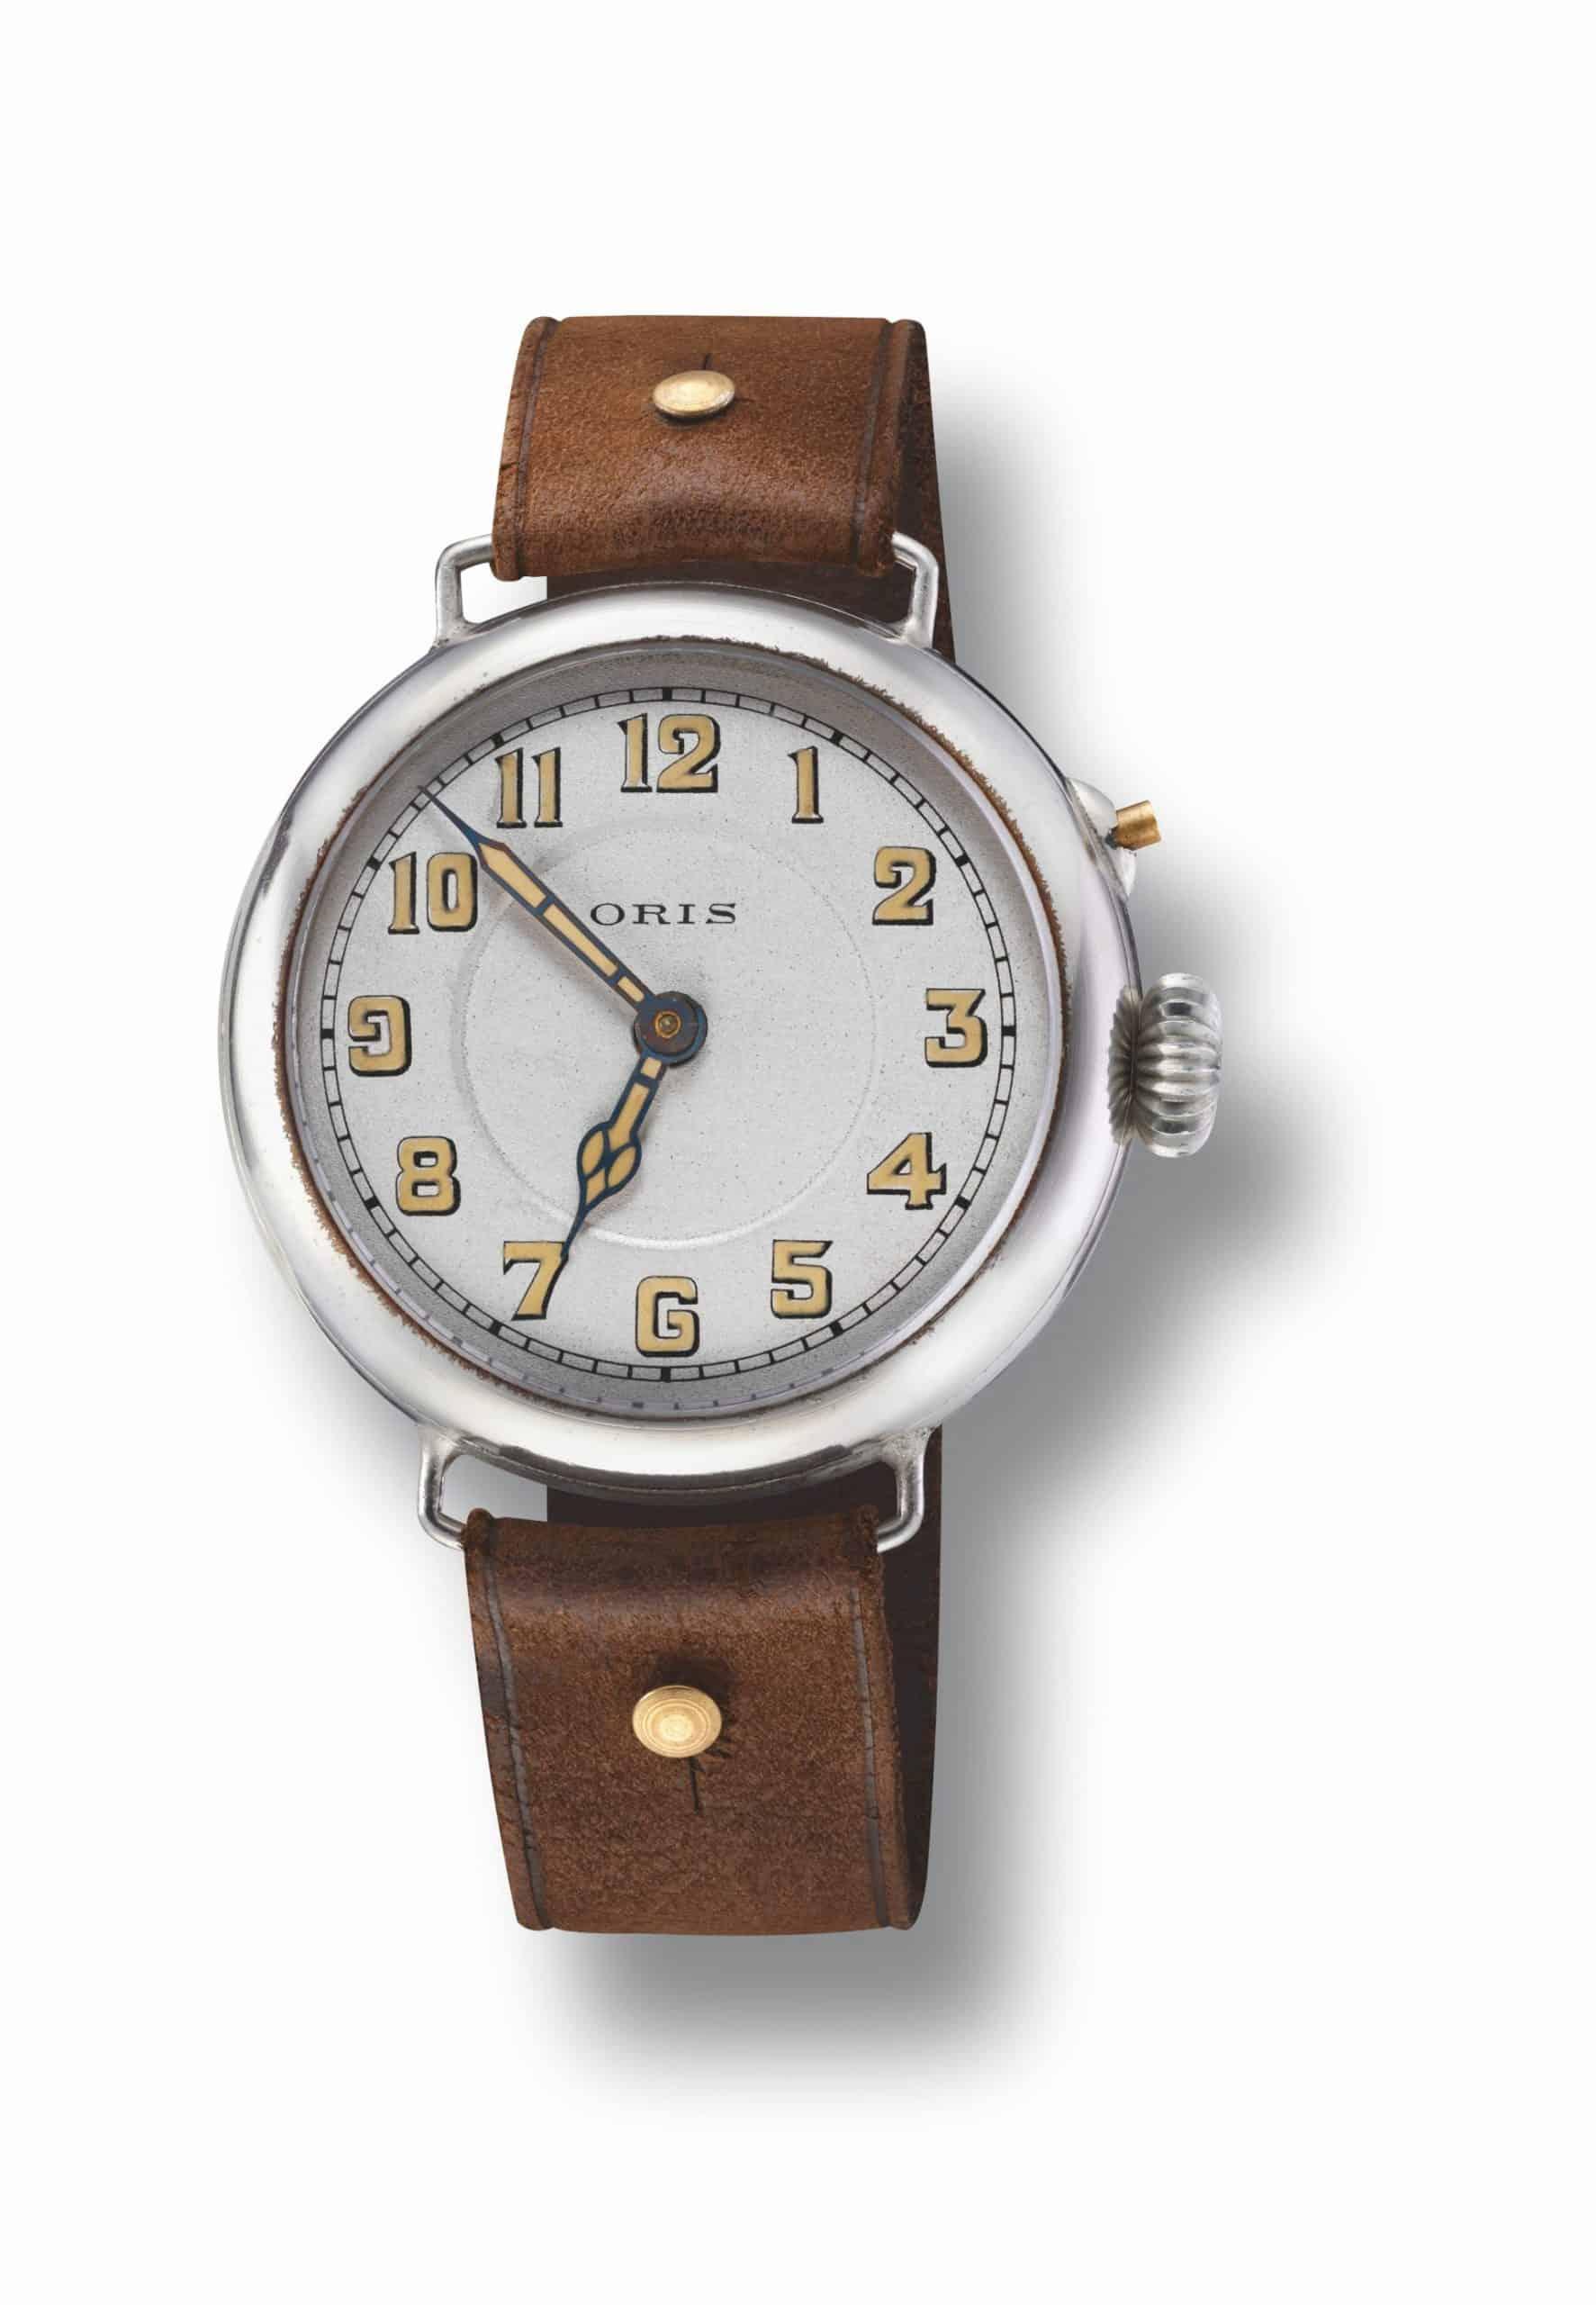 Oris Big Crown 1917 Original wirst watch Original 6861 scaled